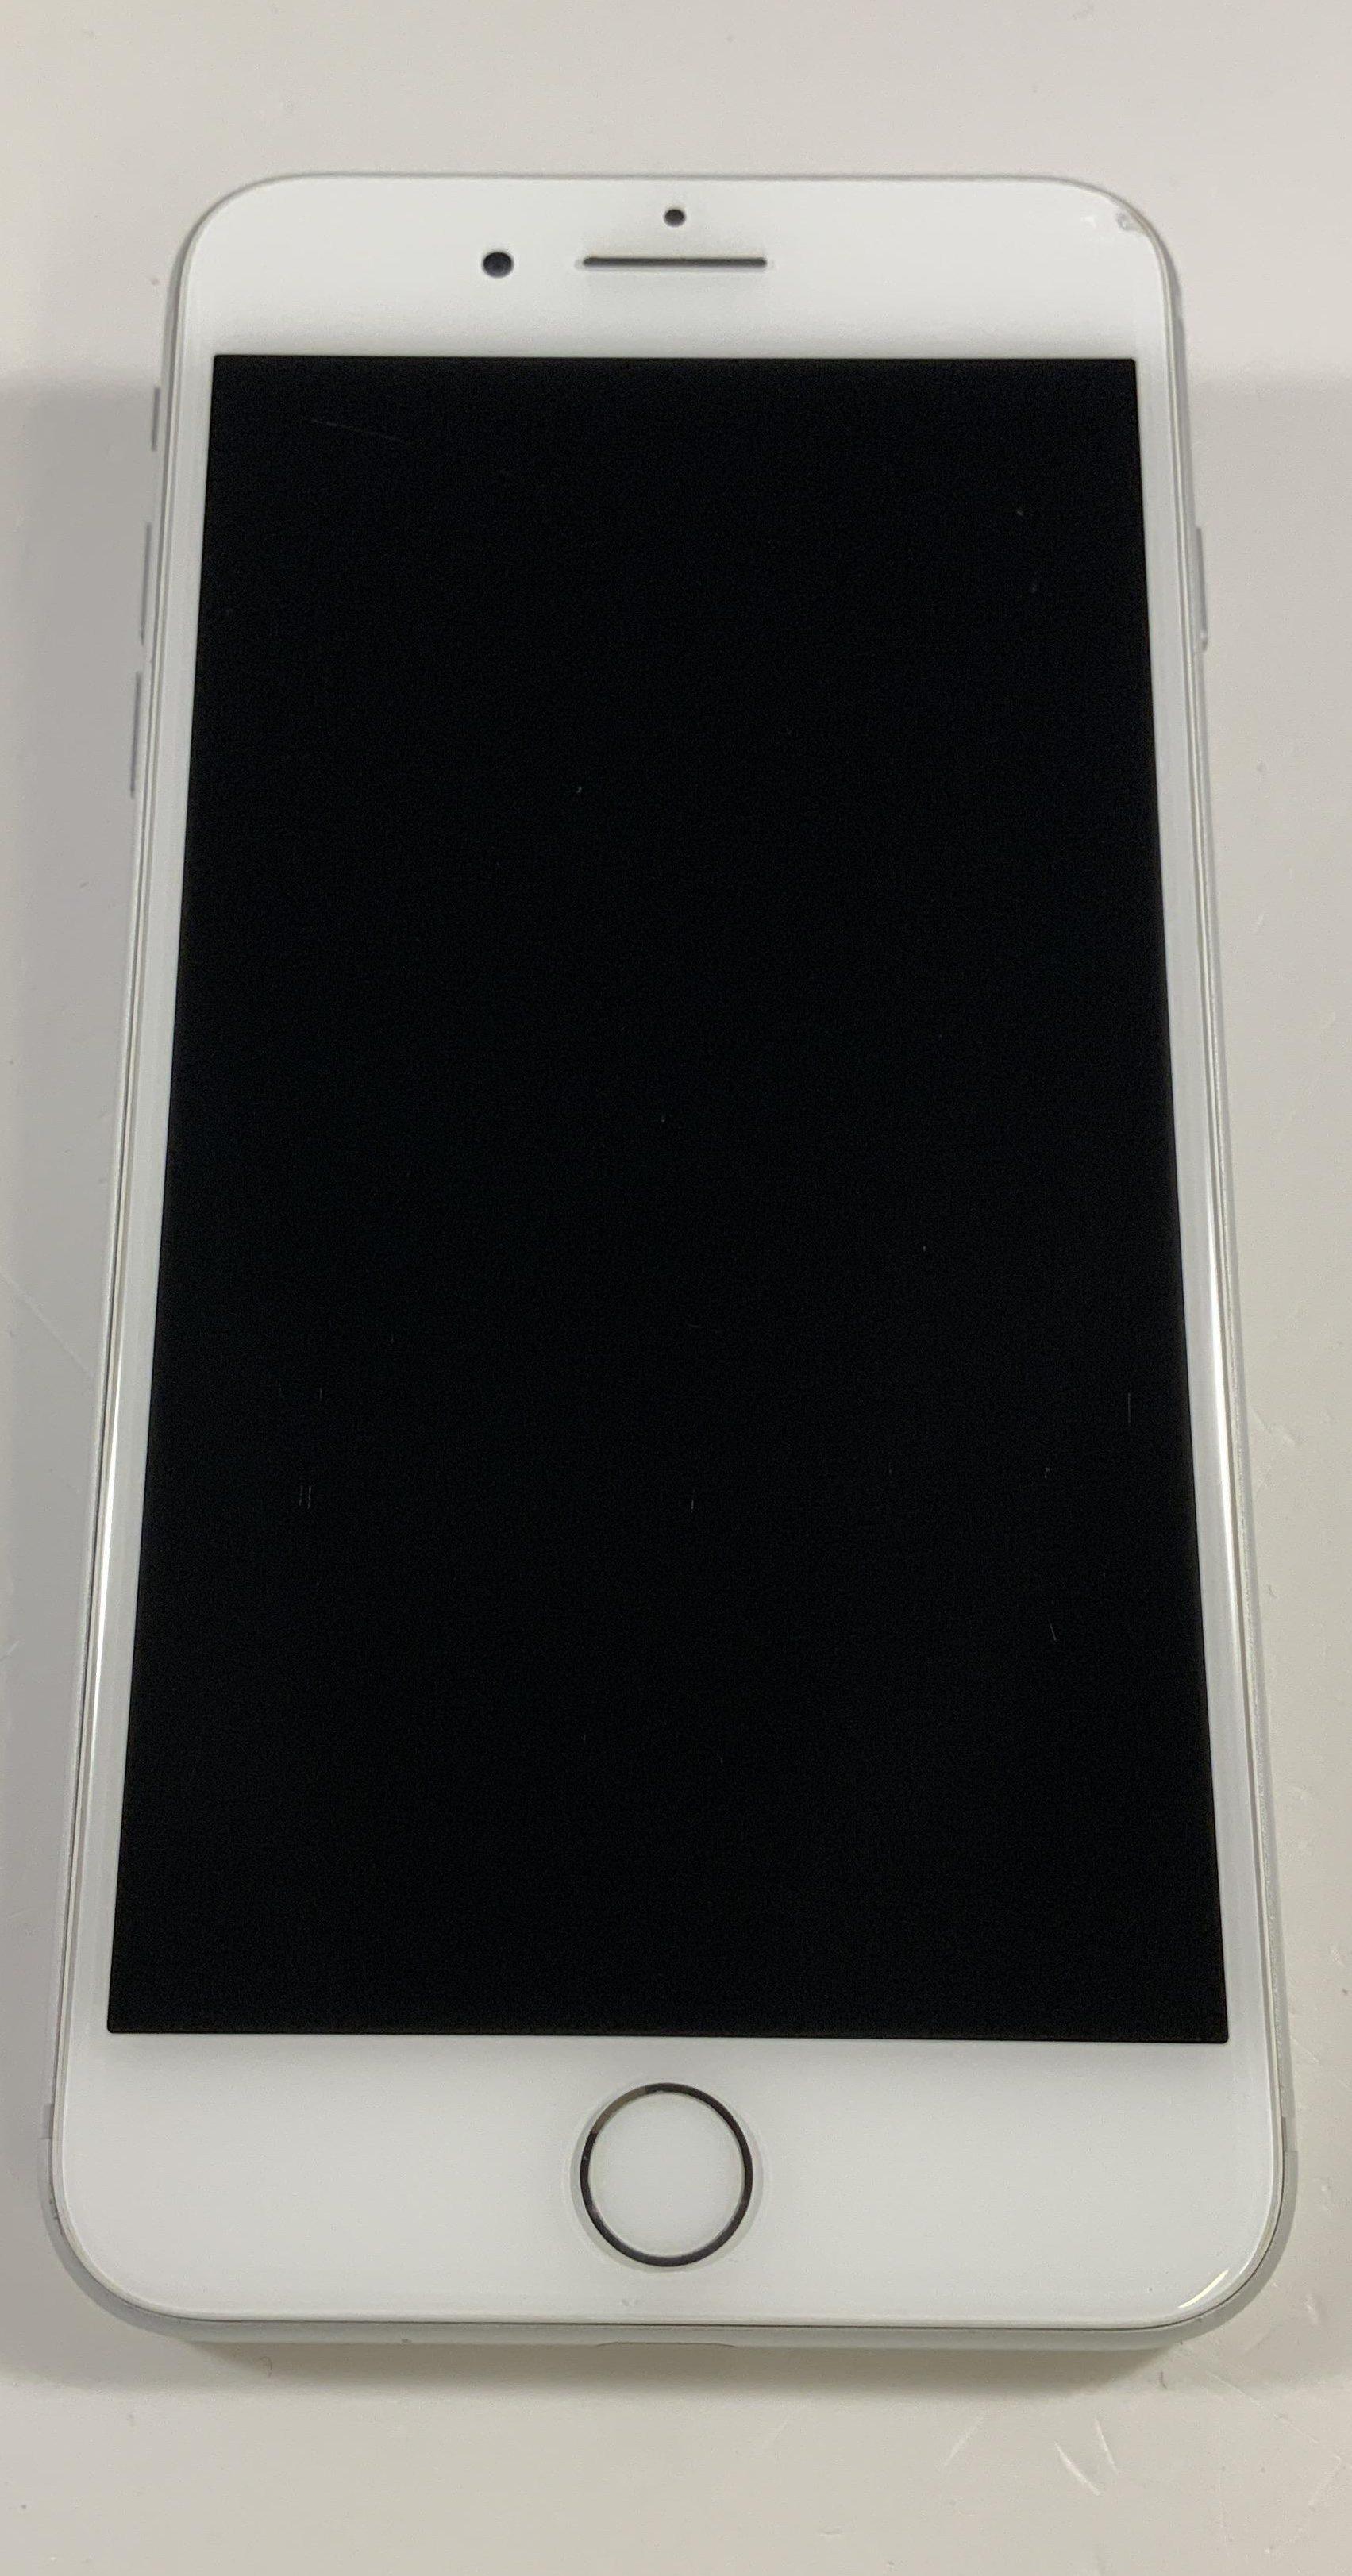 iPhone 8 Plus 64GB, 64GB, Silver, Kuva 1